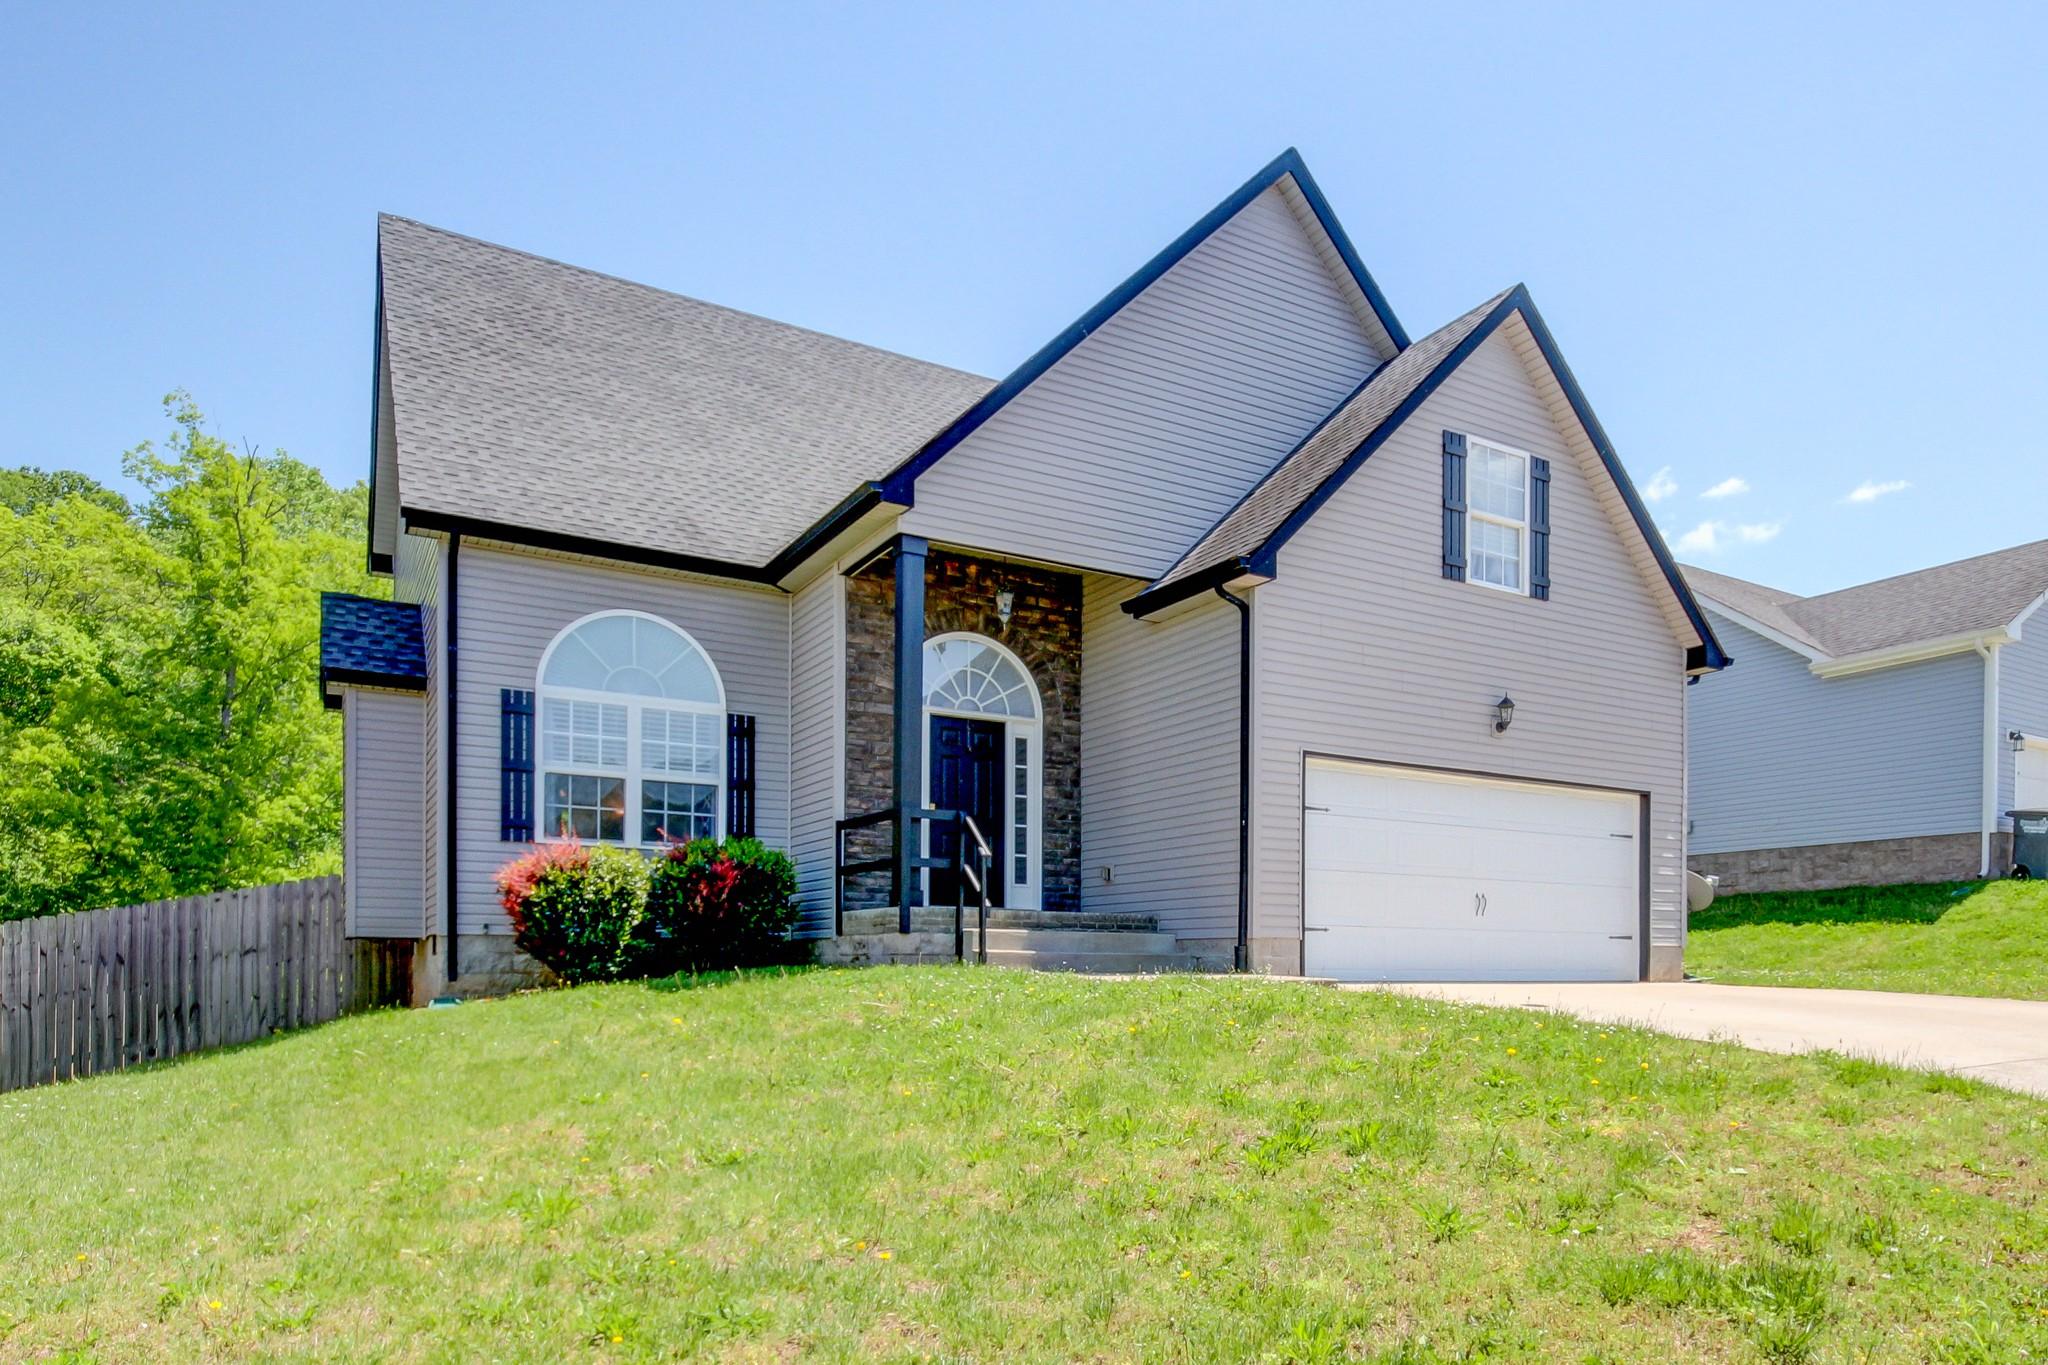 1217 Meachem Dr Property Photo - Clarksville, TN real estate listing